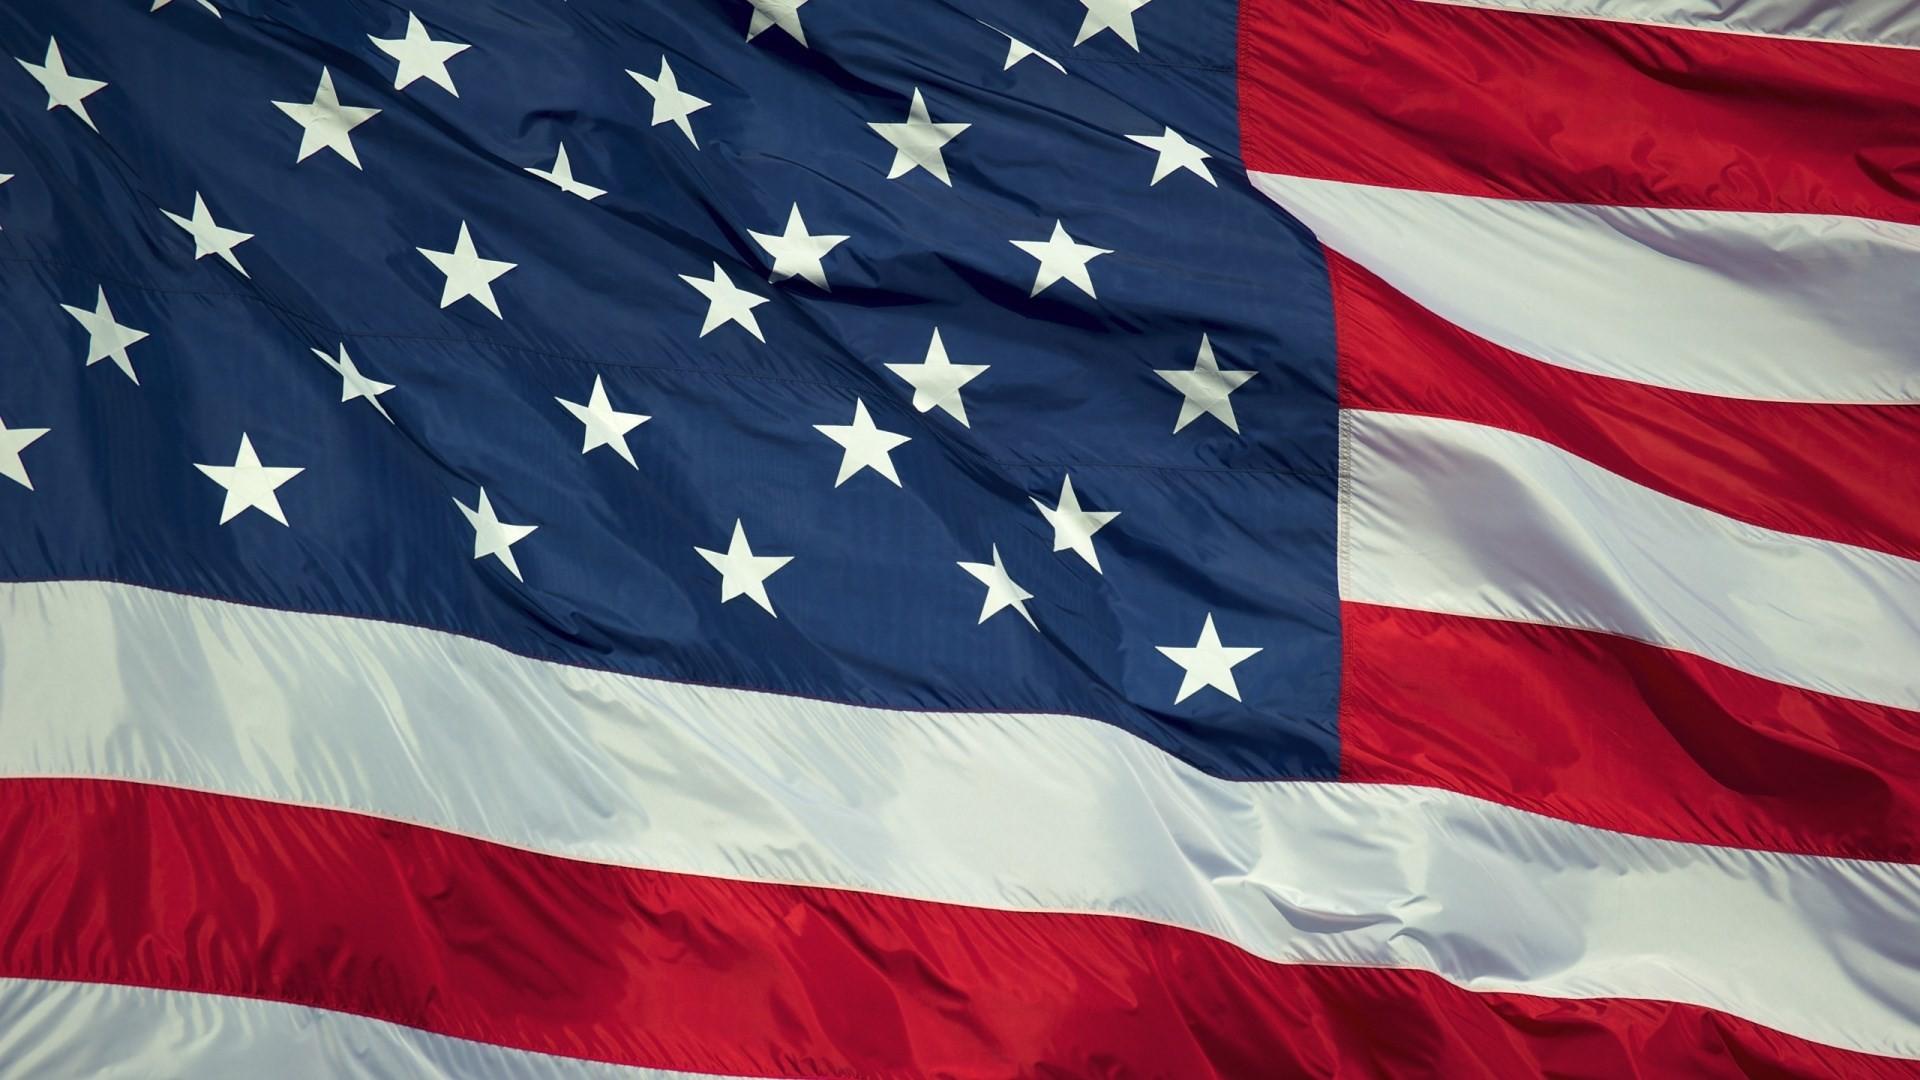 american flag wallpaper backgrounds hd